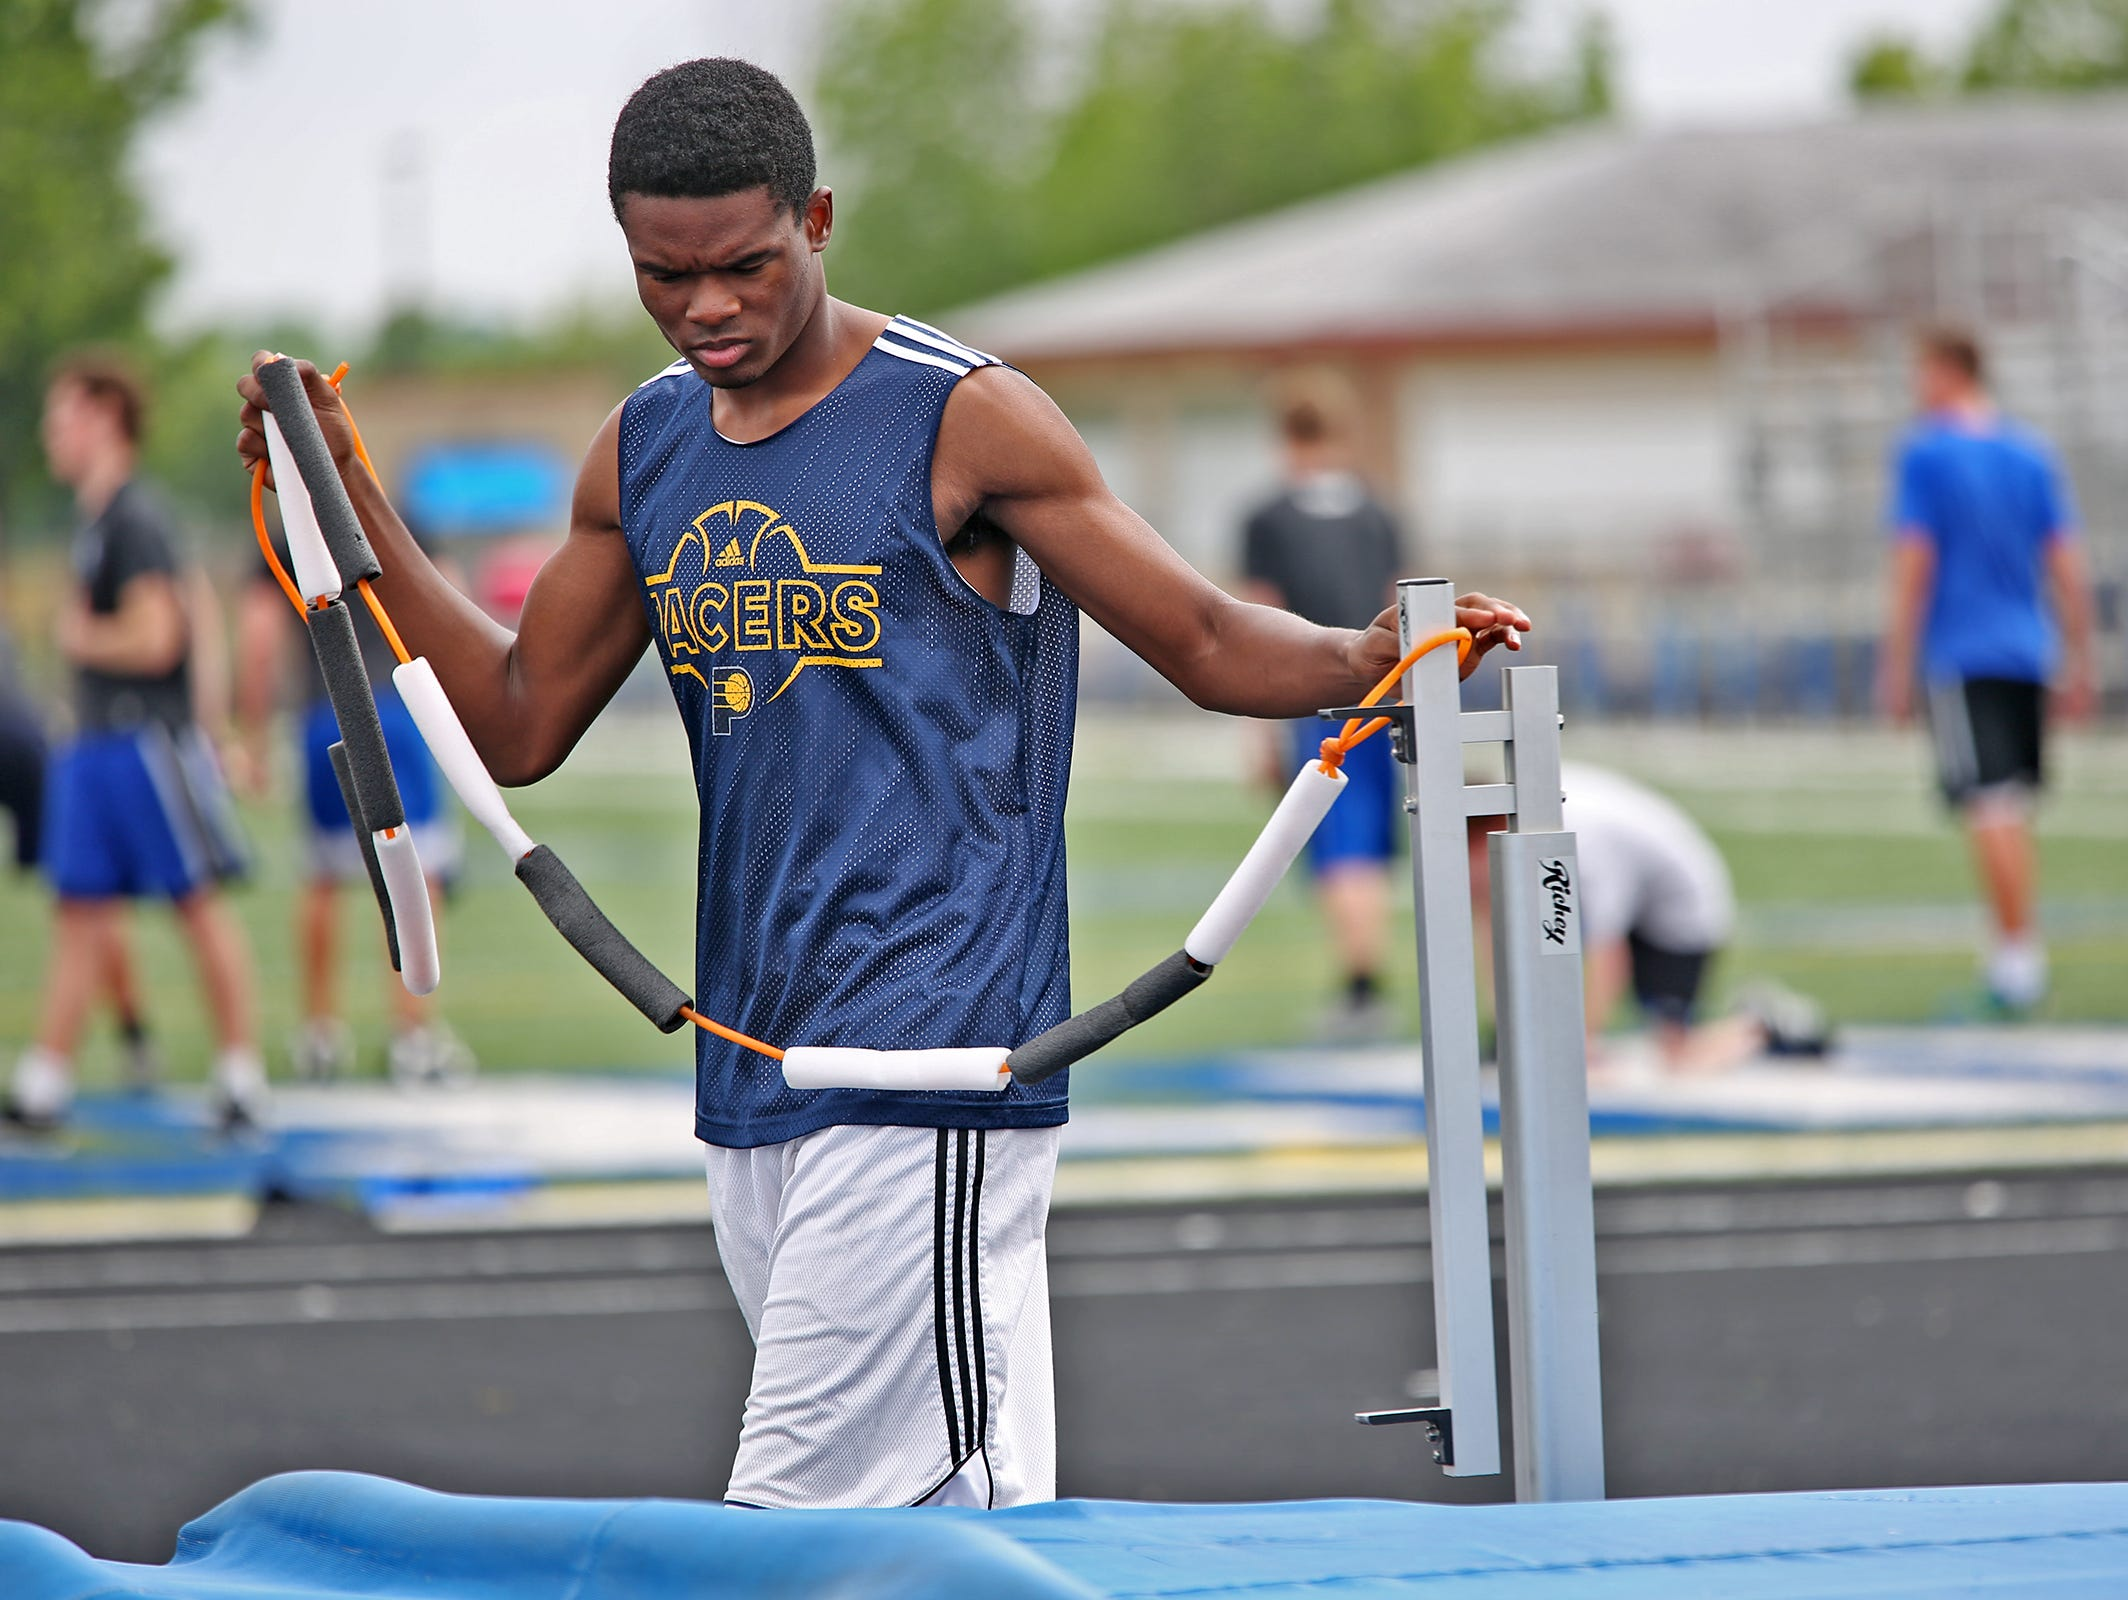 Hamilton Southeaster athlete Francis Ehigbai puts up a practice bar for high jump practice, June 1, 2015.